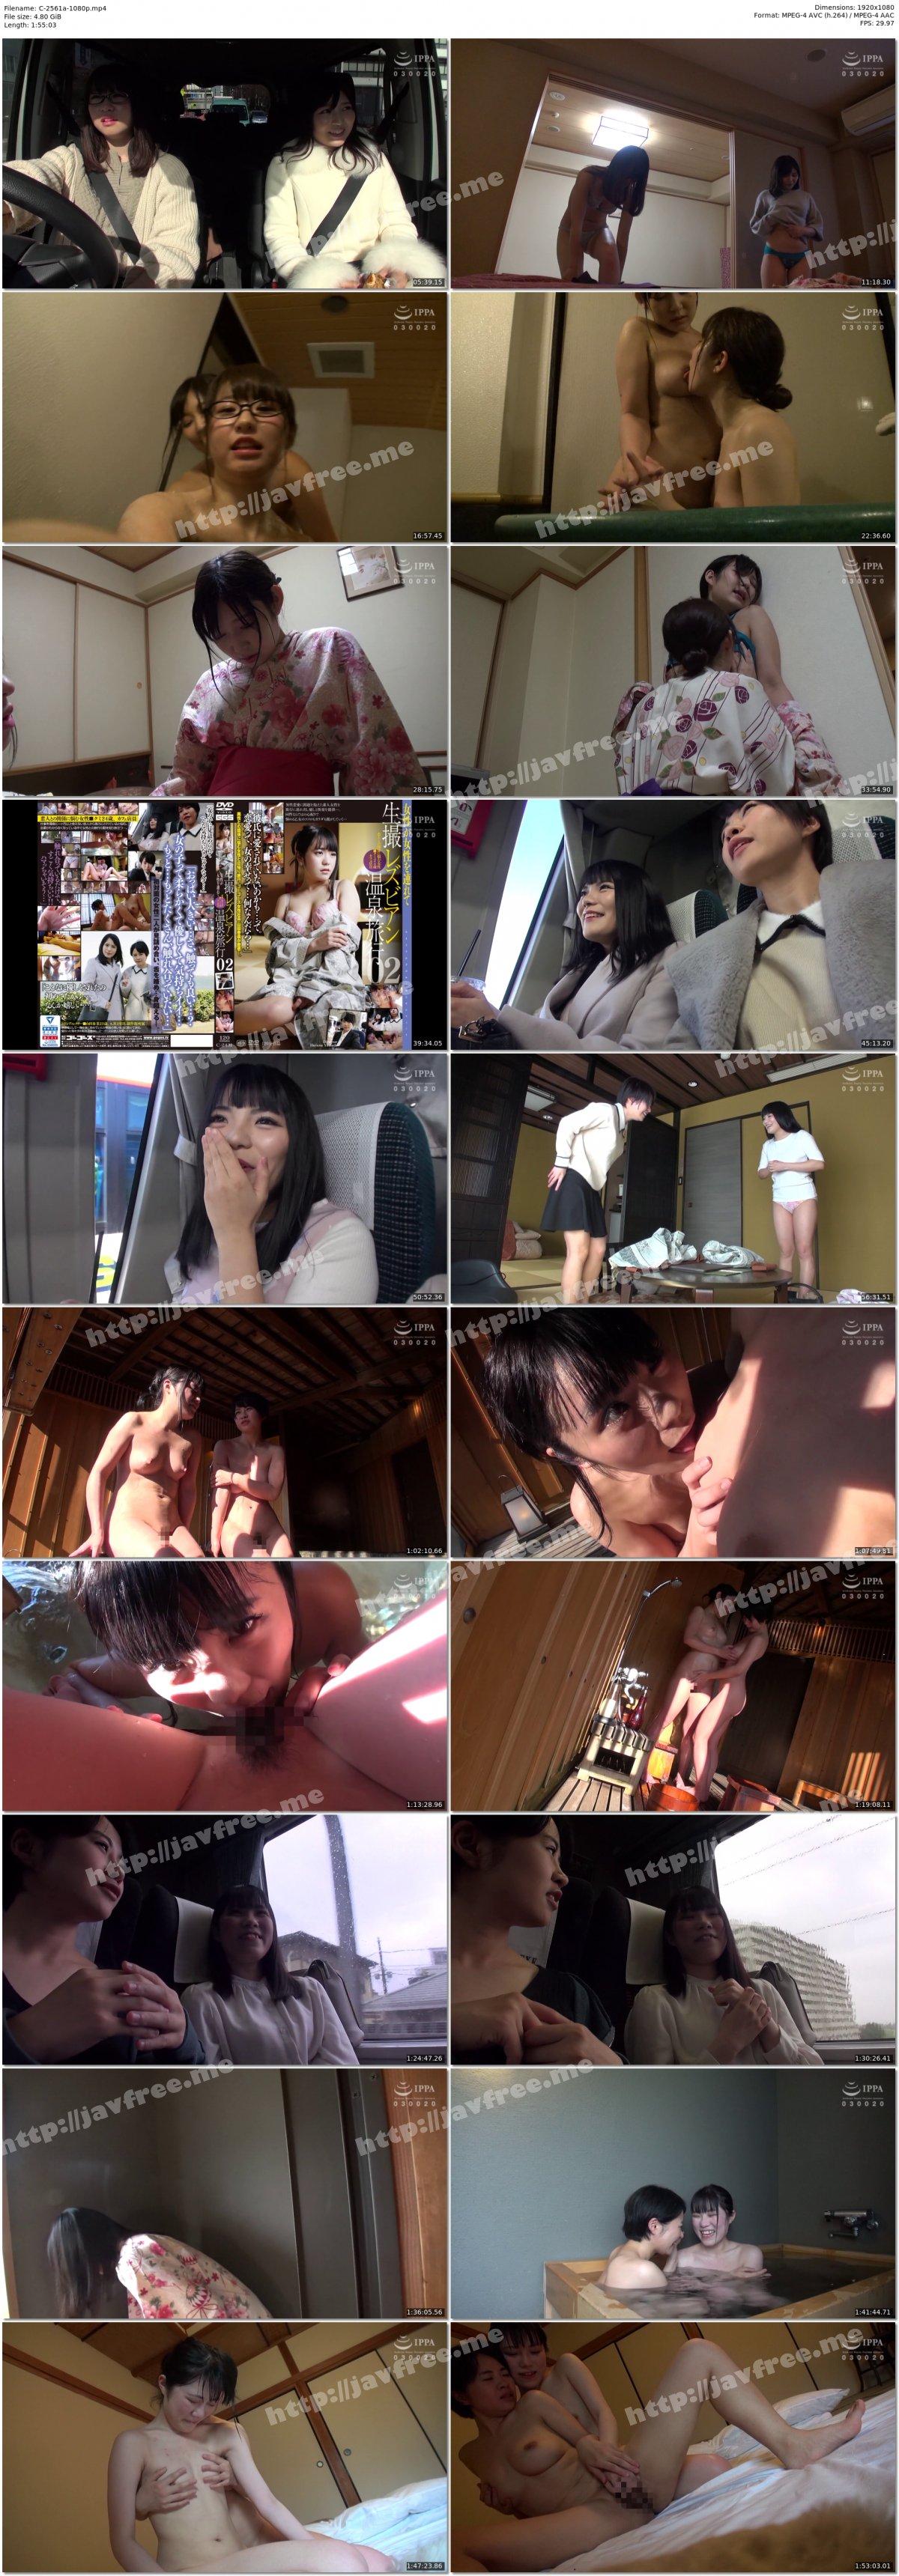 [HD][C-2561] 生撮 レズビアン温泉旅行 The BEST 2019,Mar.-Oct - image C-2561a-1080p on https://javfree.me